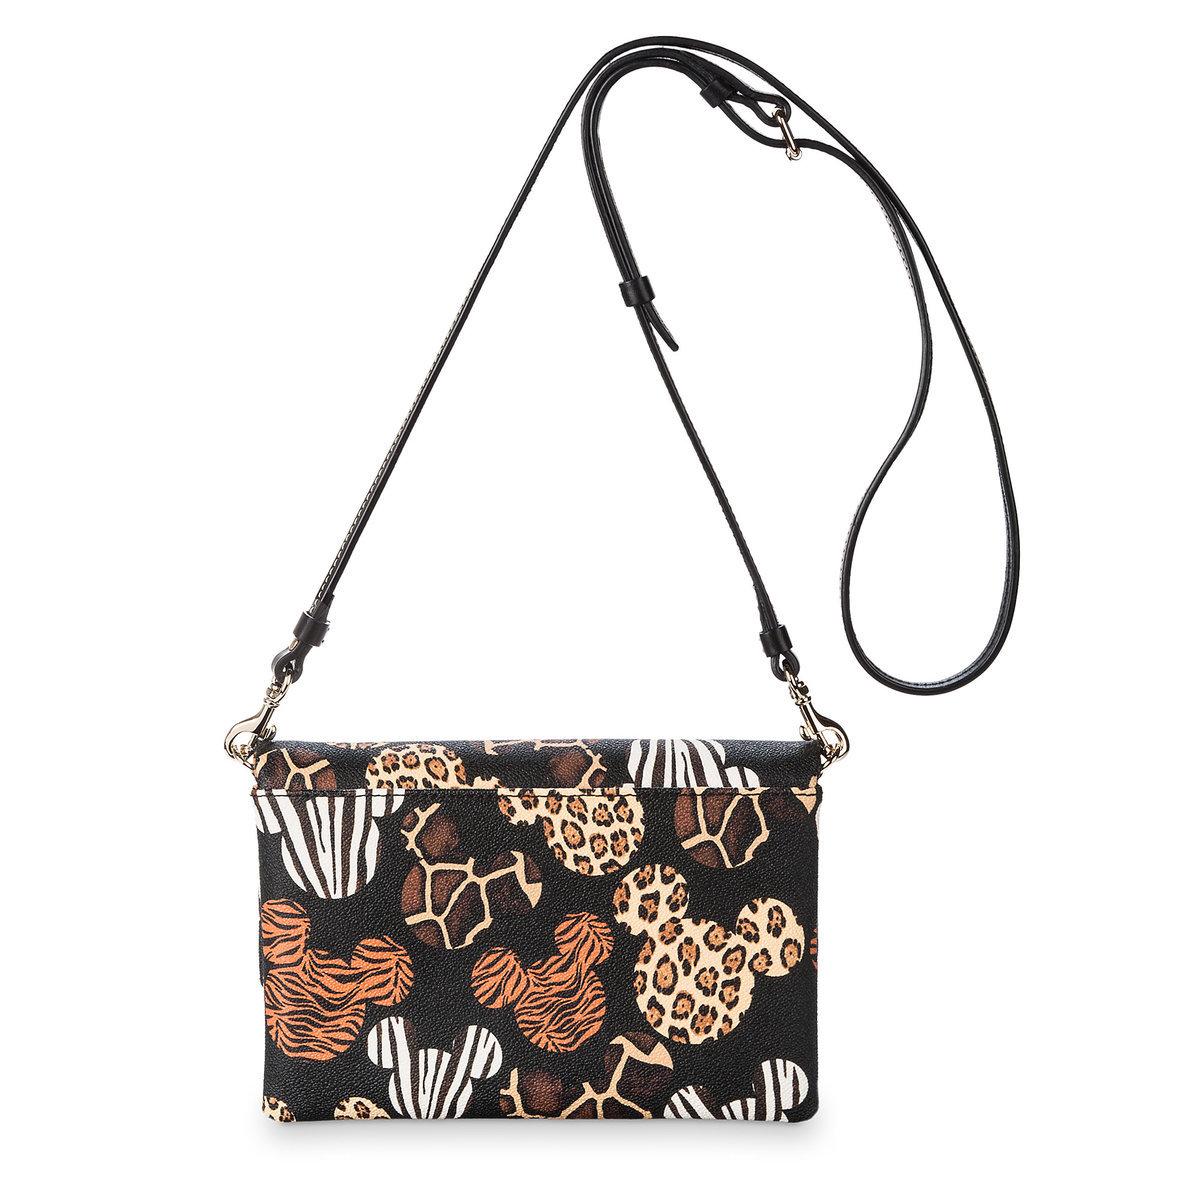 47462b749f22 Disney Dooney & Bourke Bag - Mickey Animal Print Foldover Crossbody